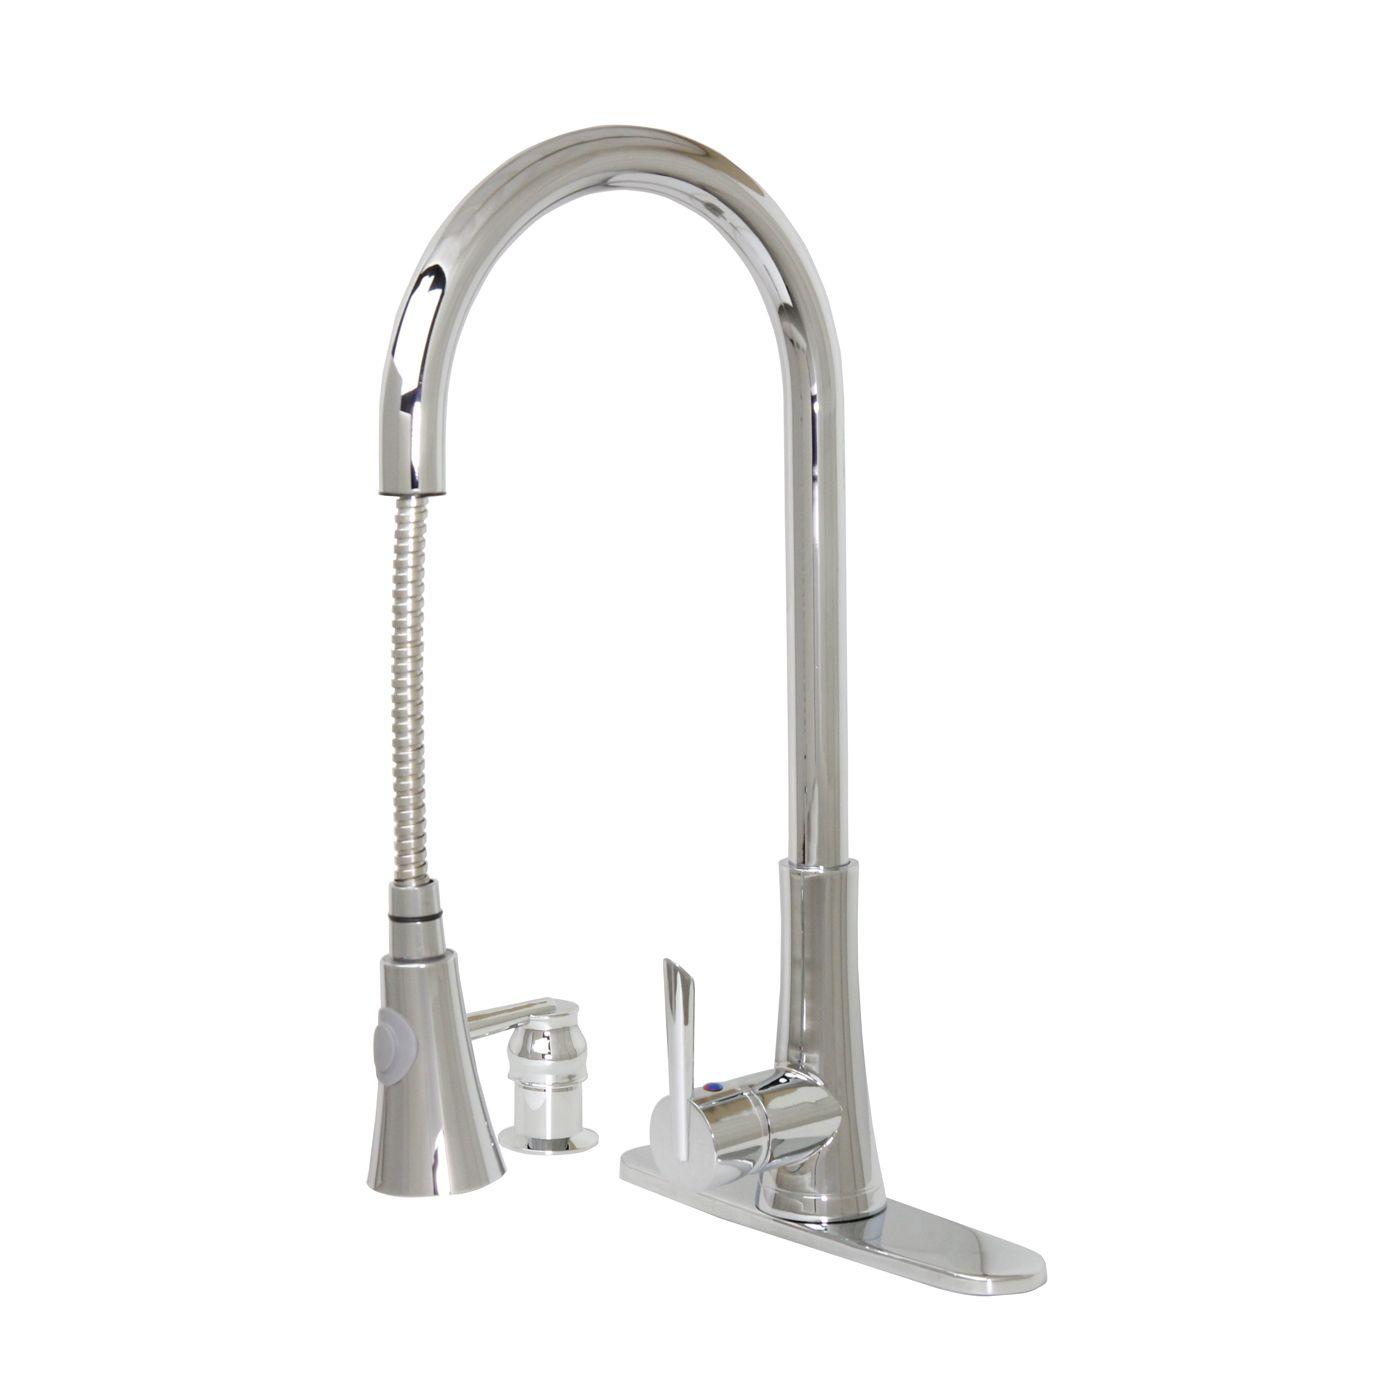 Shop Dyconn Faucets Dyconn Tb001 A18 Modern Kitchen Faucet At Atg